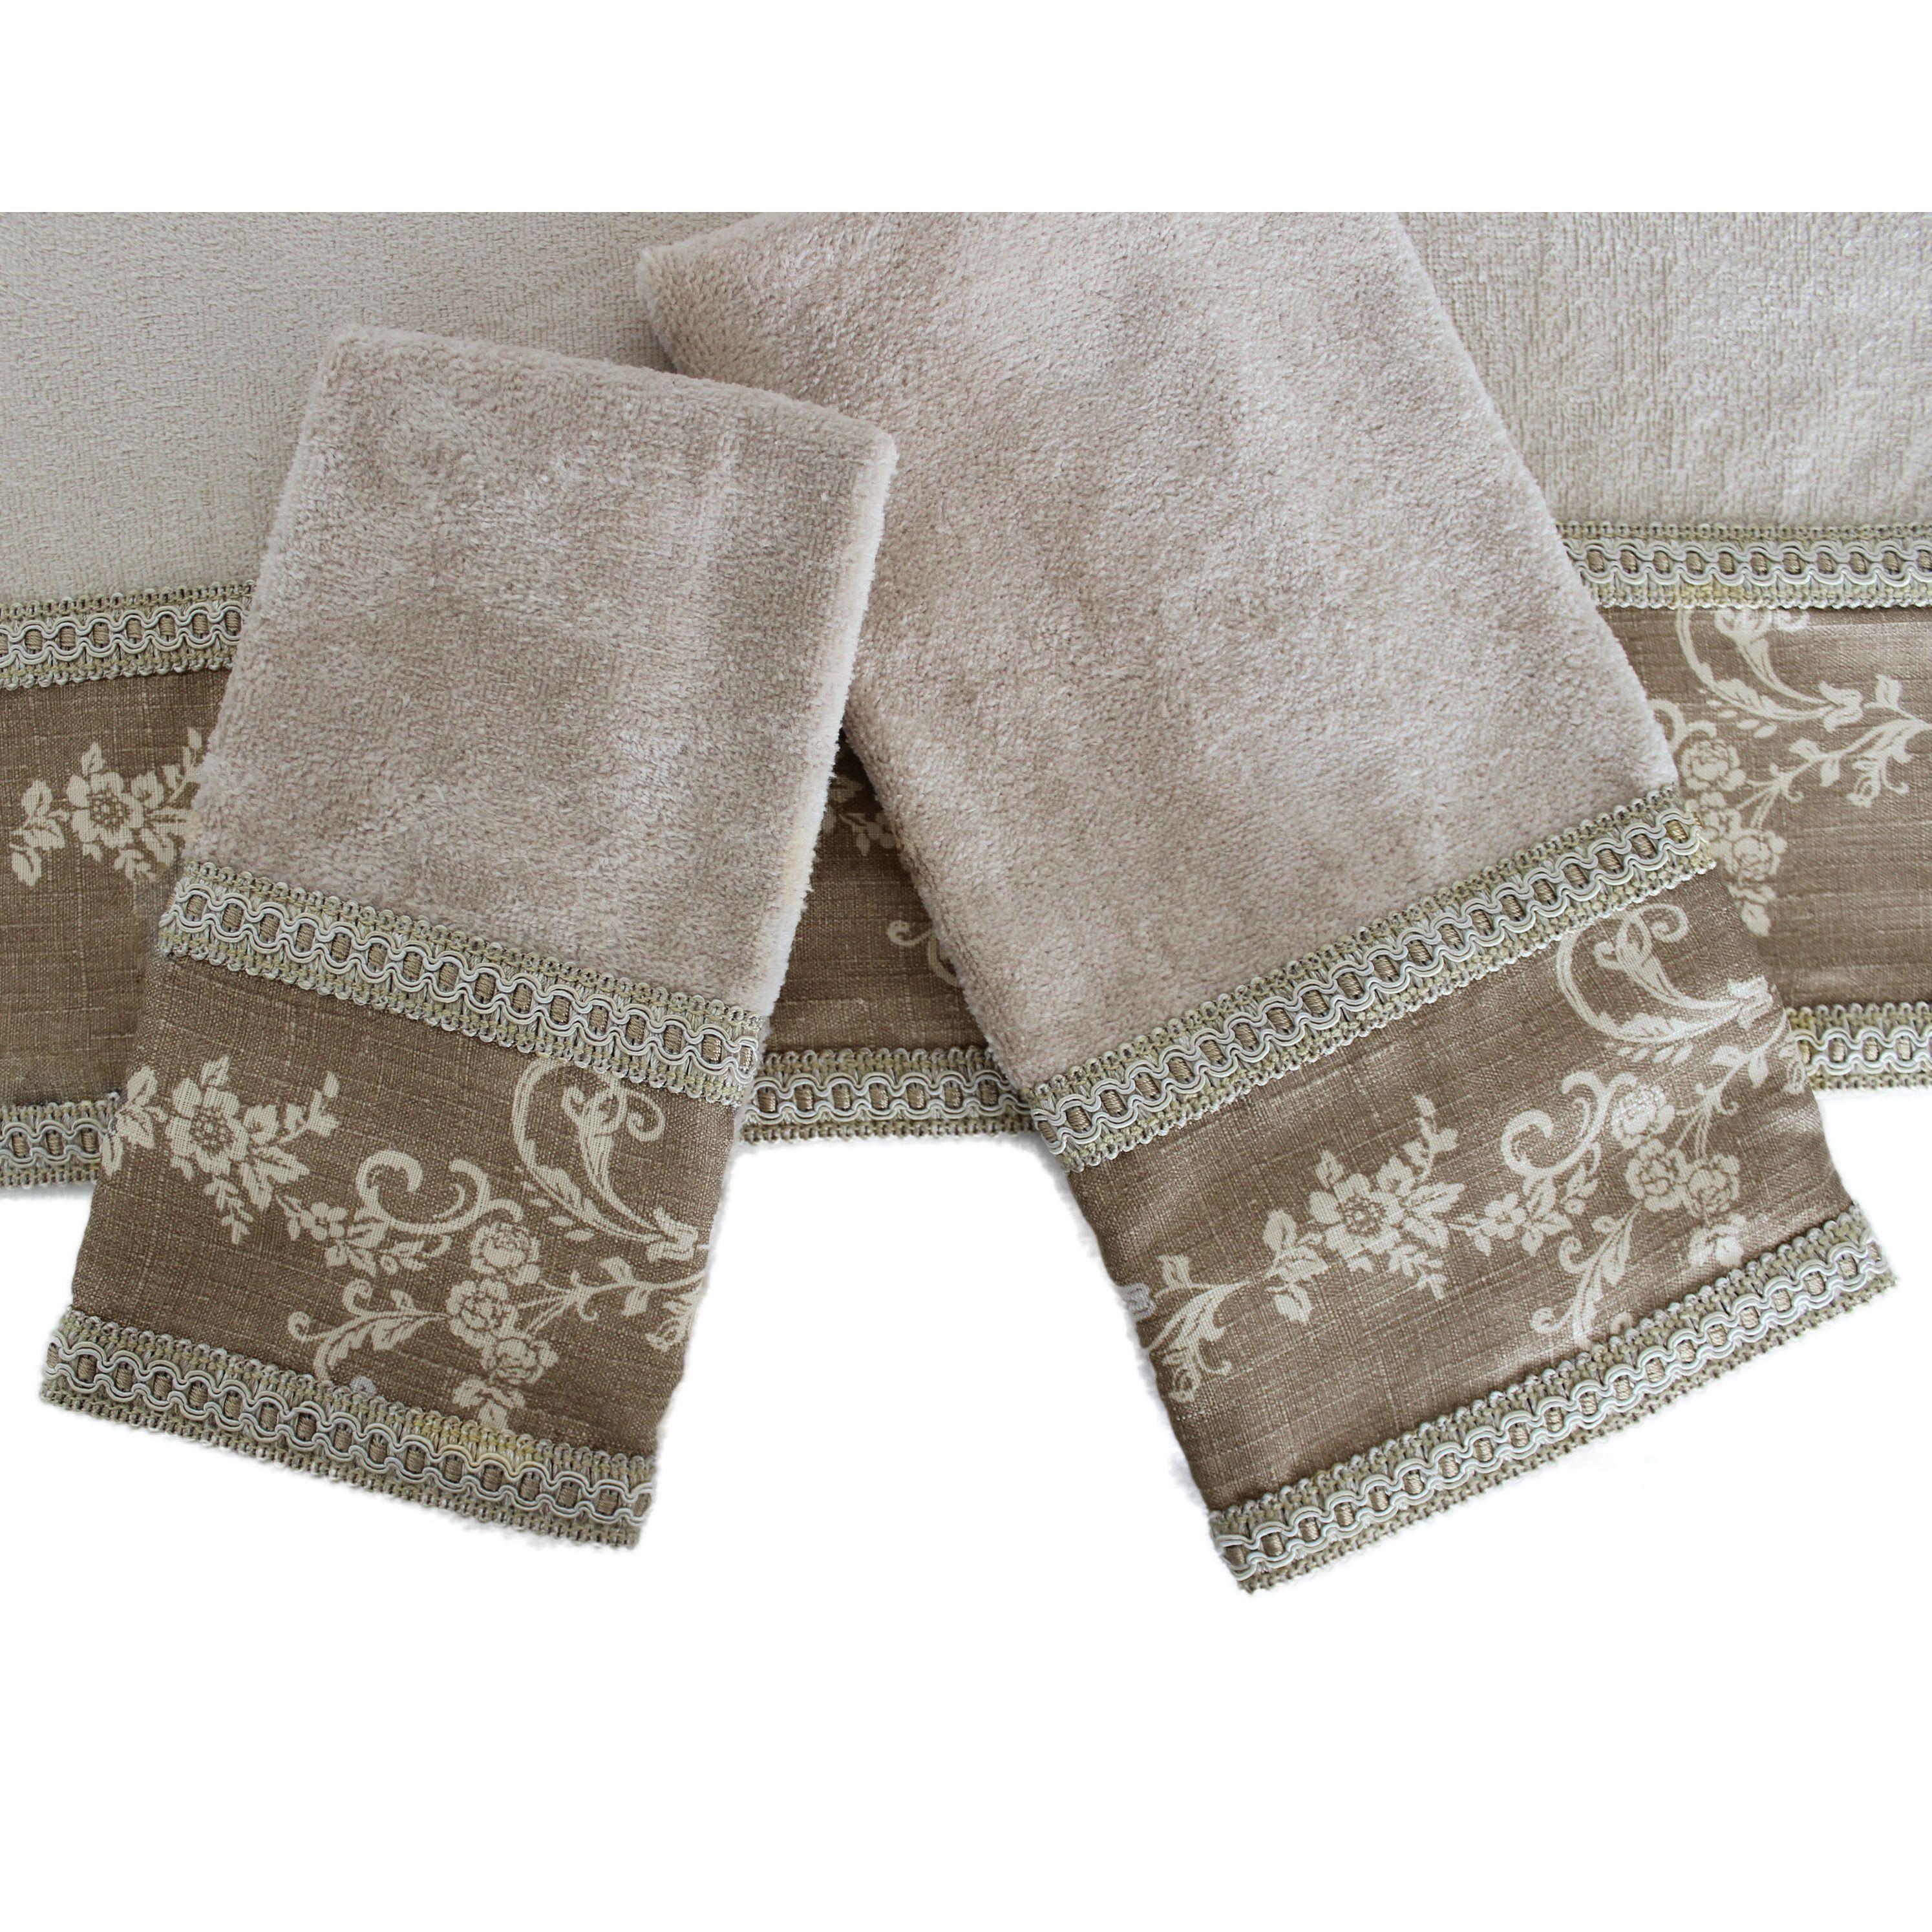 decorative original patterned luxury and fringe bath towel with embellished embellish avanti towels bathroom brown elegant blue decor sets